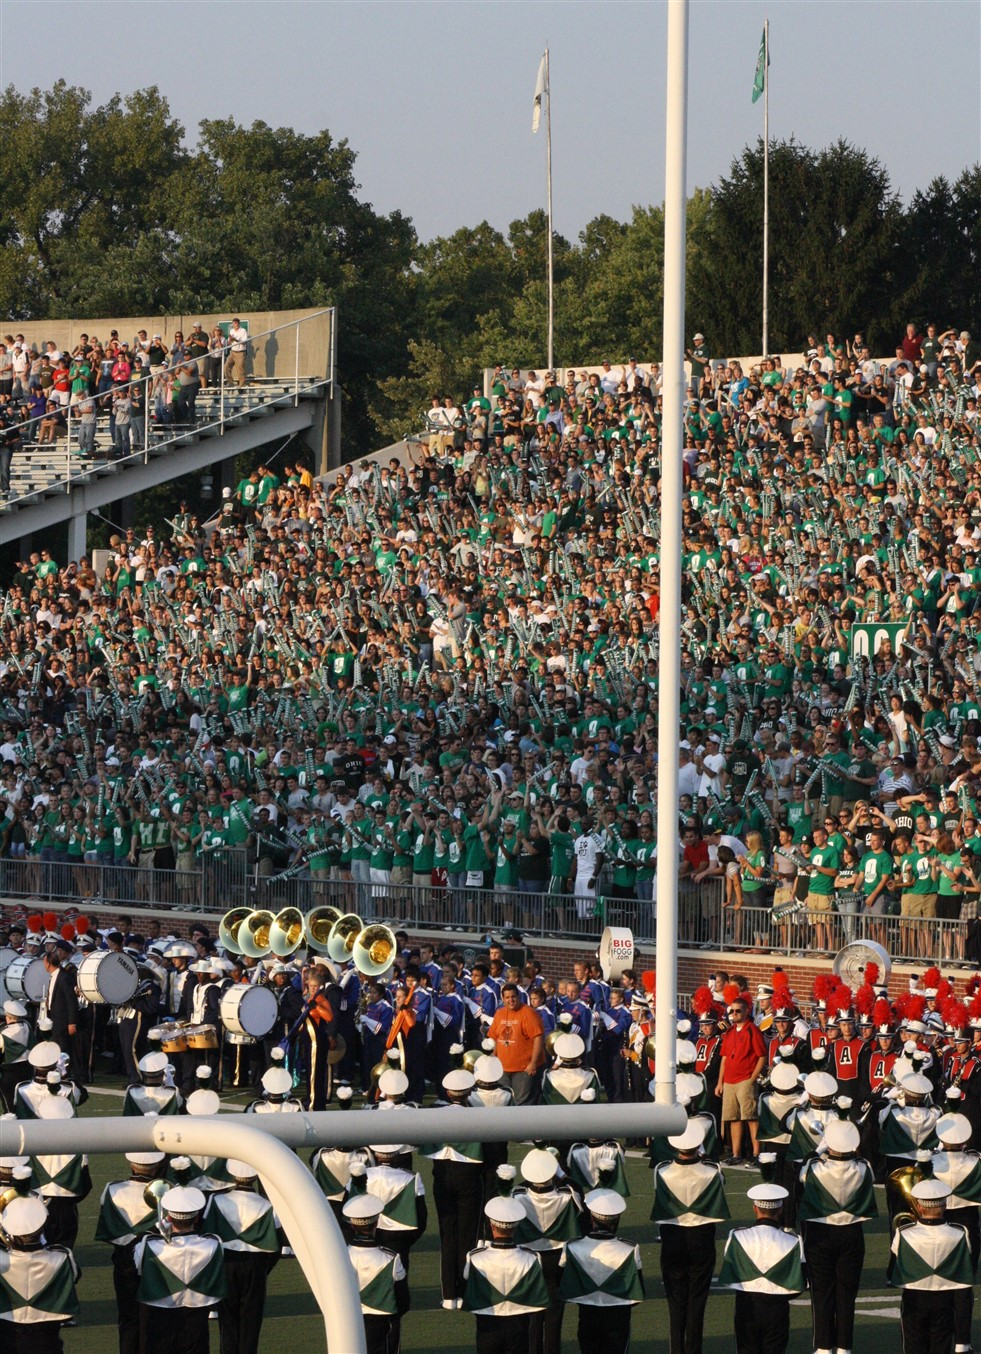 2009 09 05 10 Ohio University Football.jpg